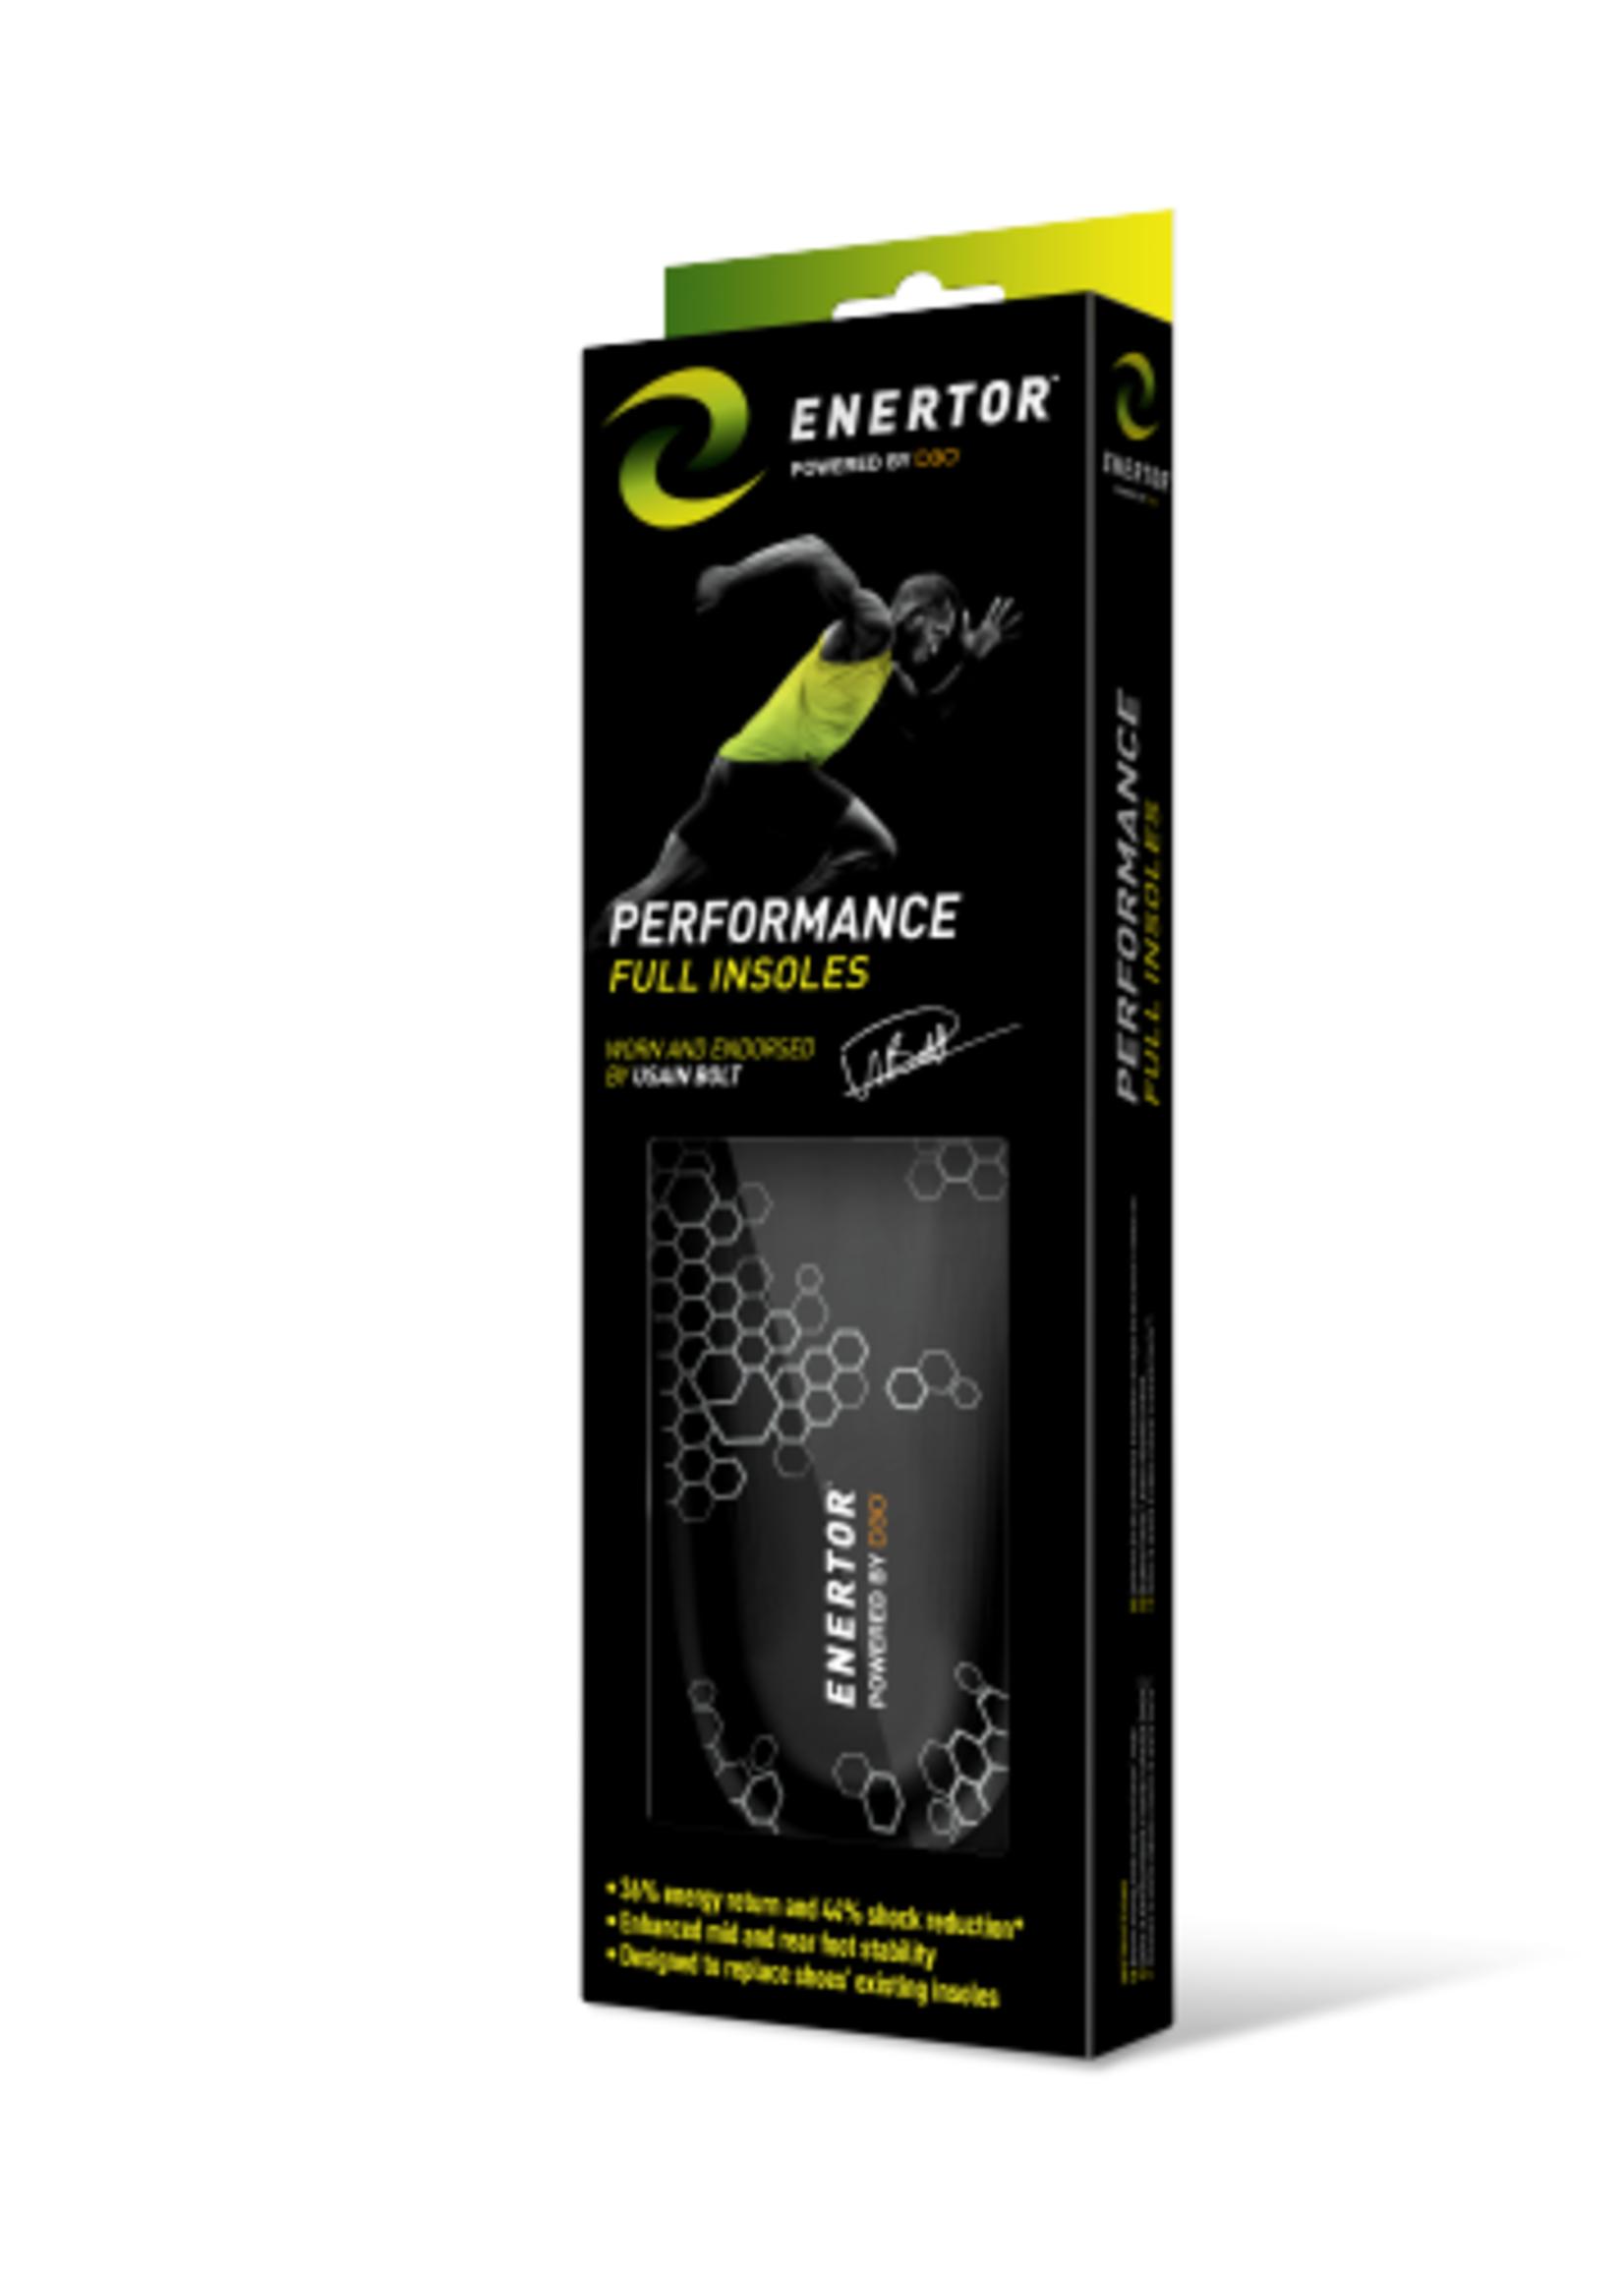 Enertor Enertor Performance Full Insole